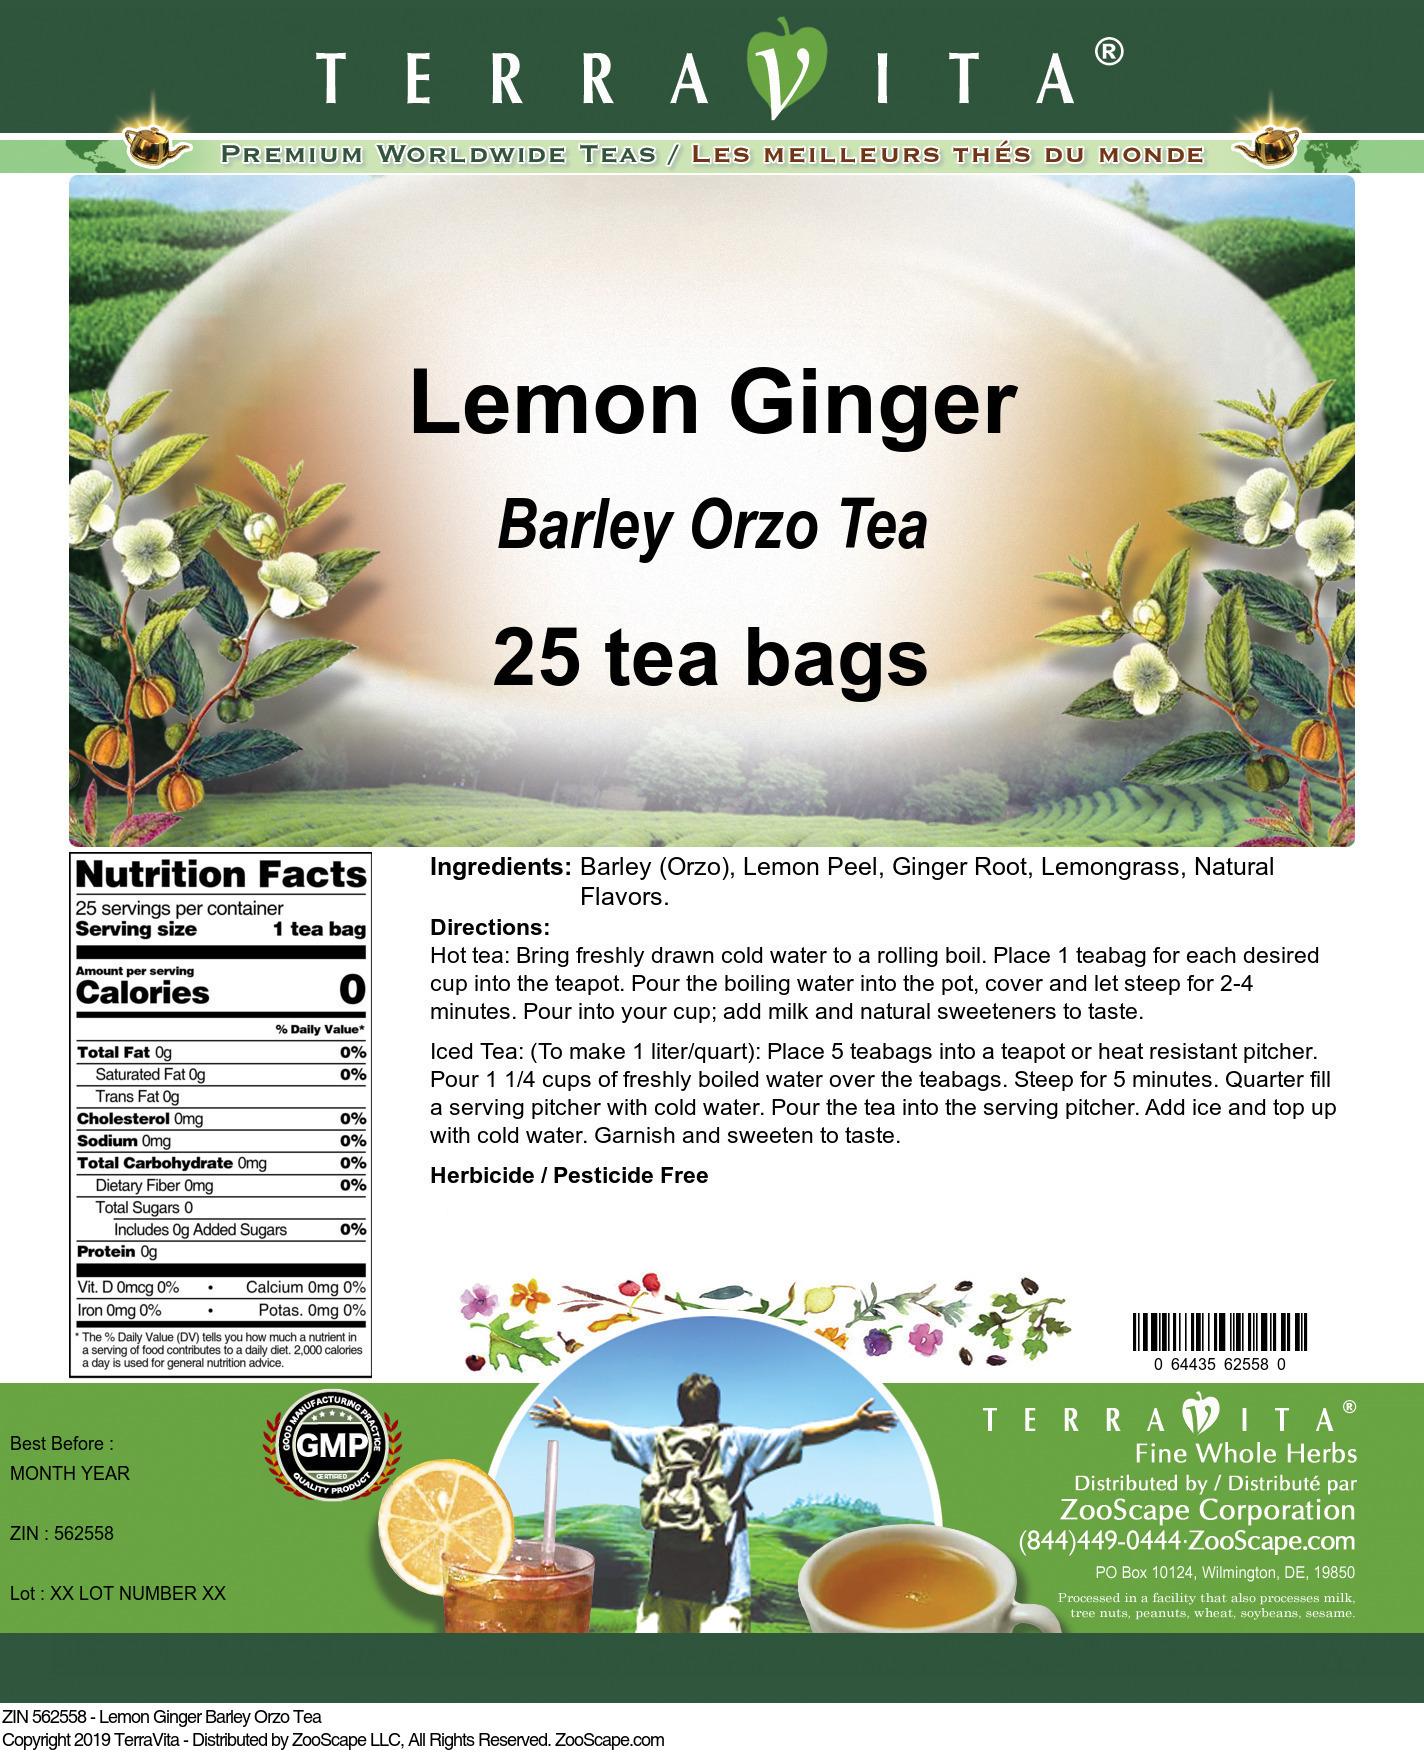 Lemon Ginger Barley Orzo